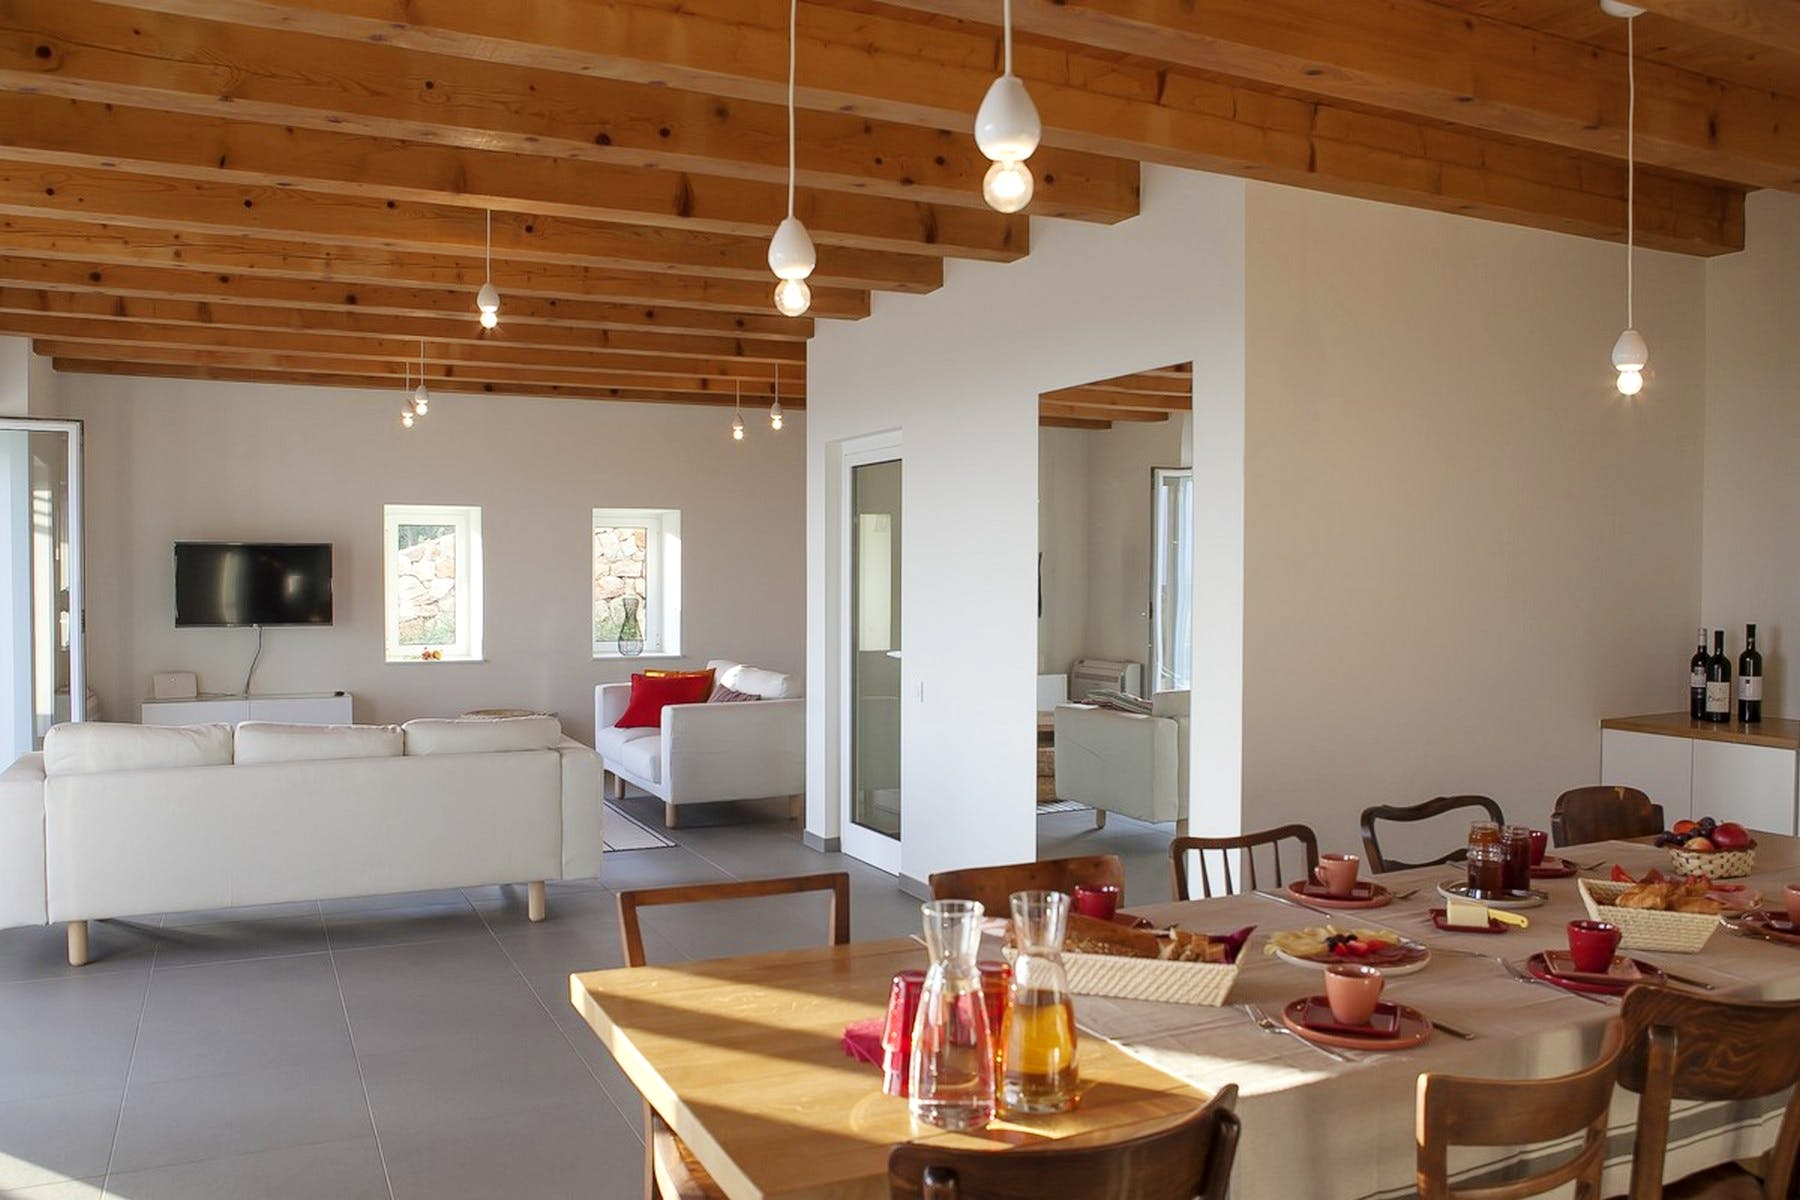 Pogled na dnevnu sobu iz kuhinje